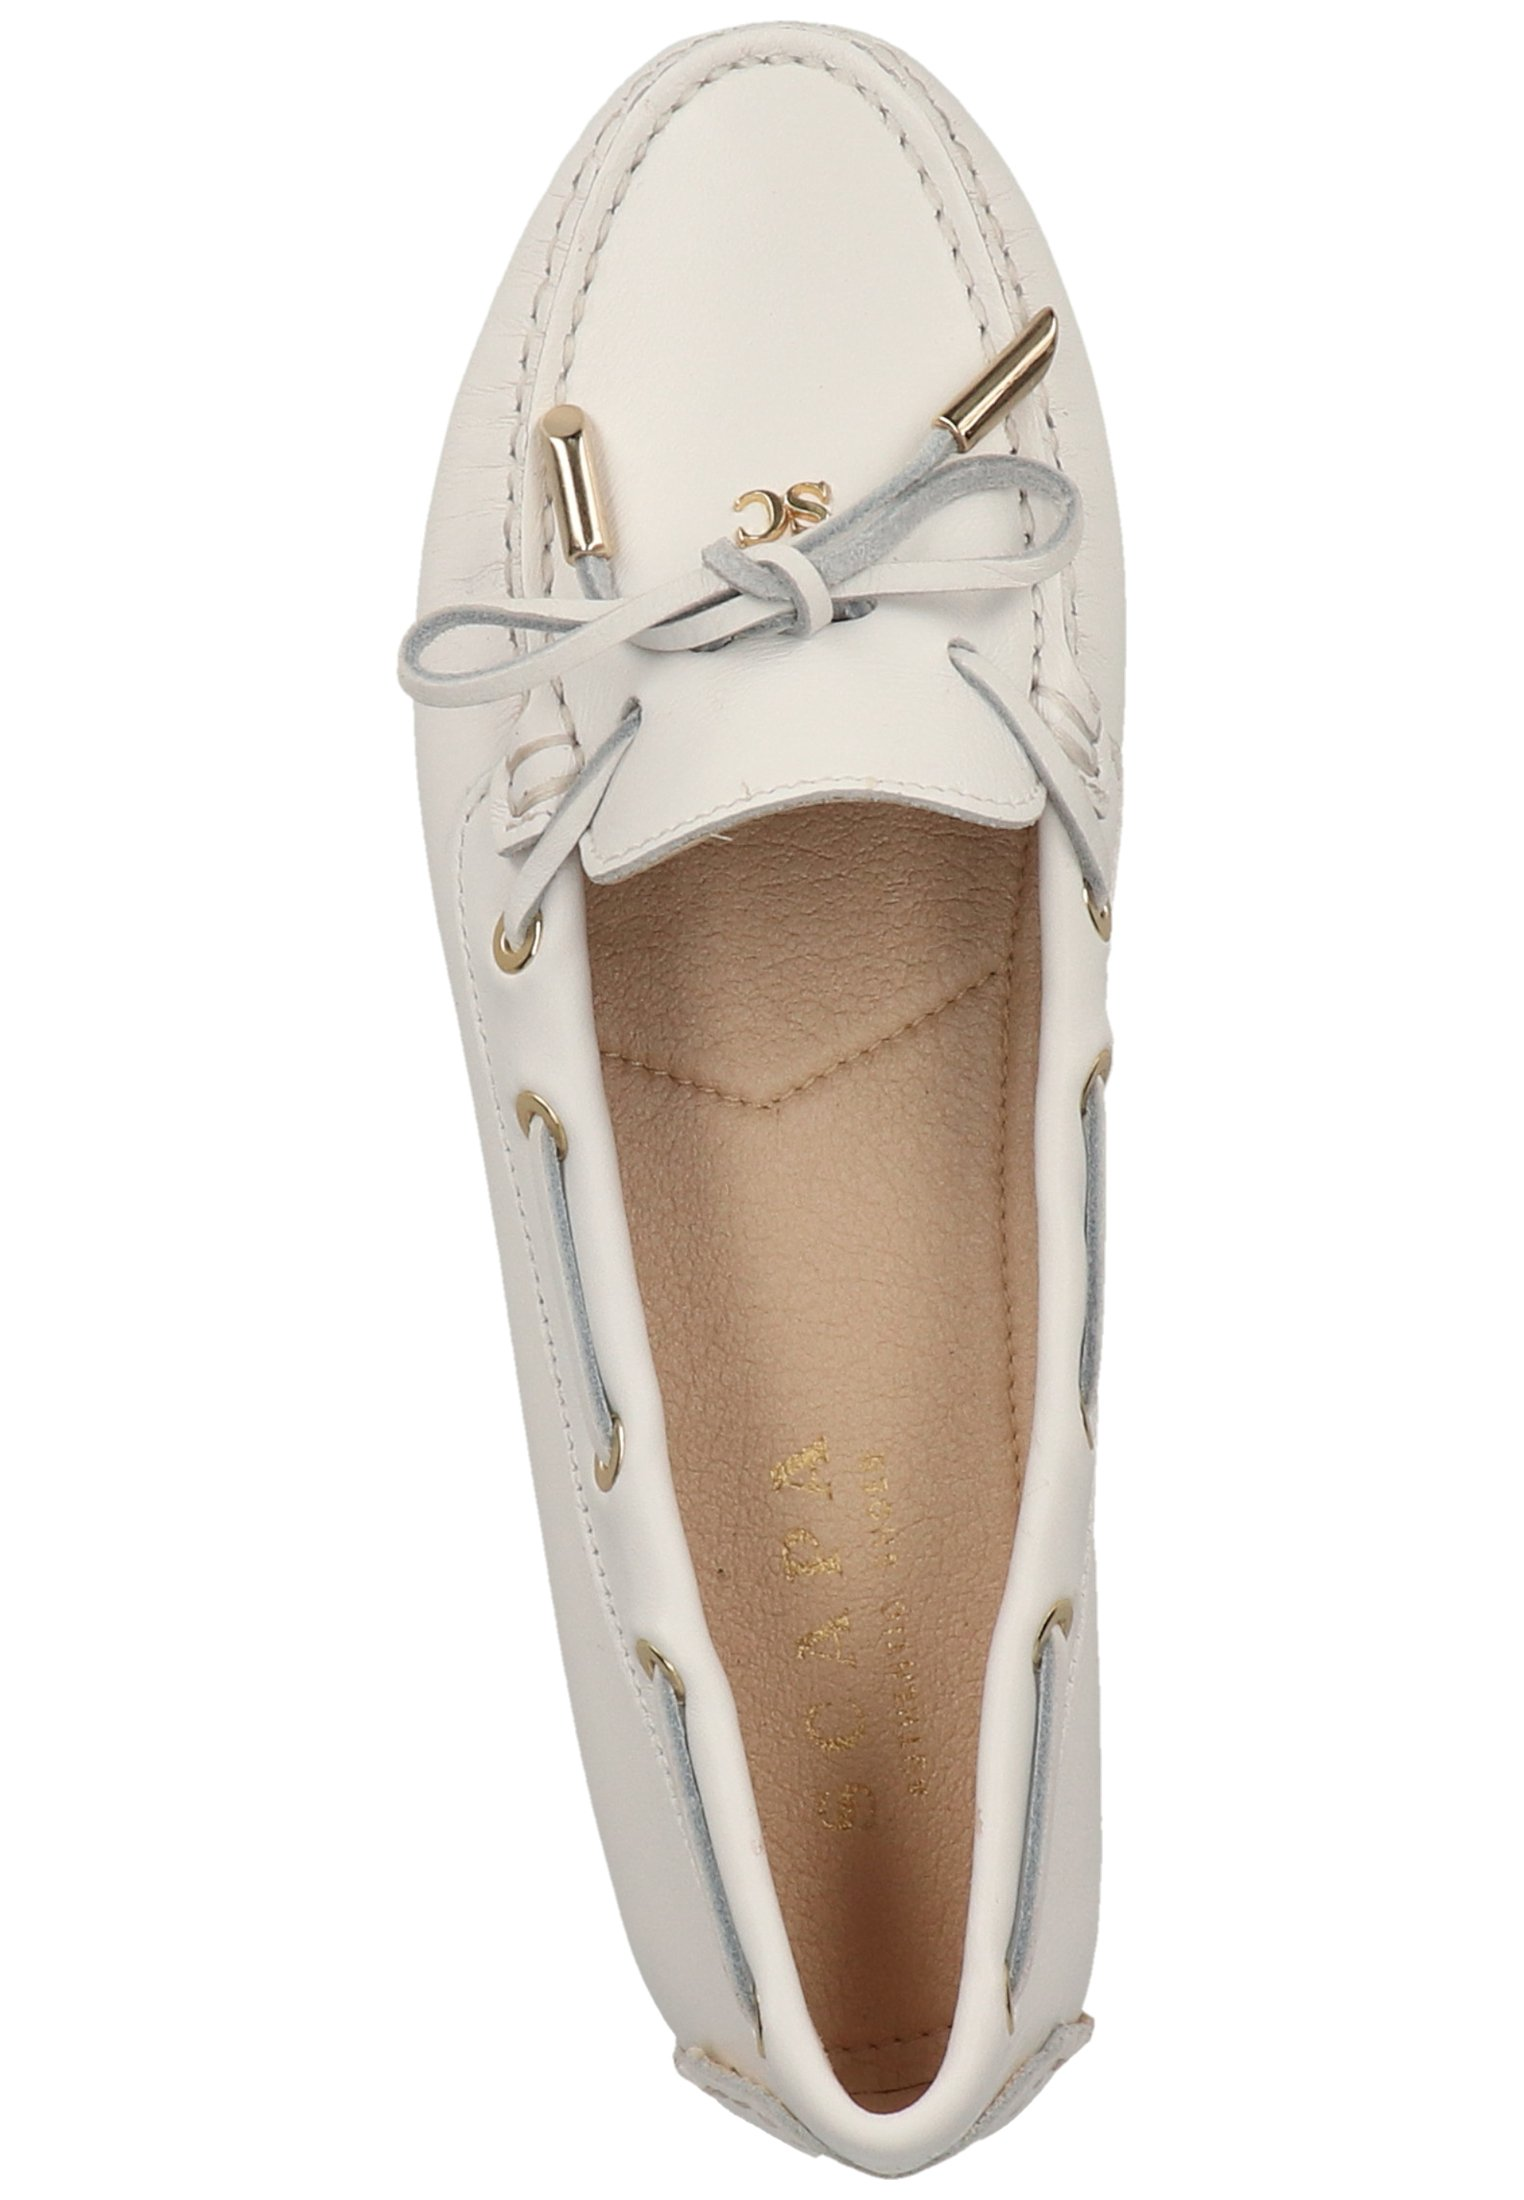 Scapa Chaussures Bateau - White